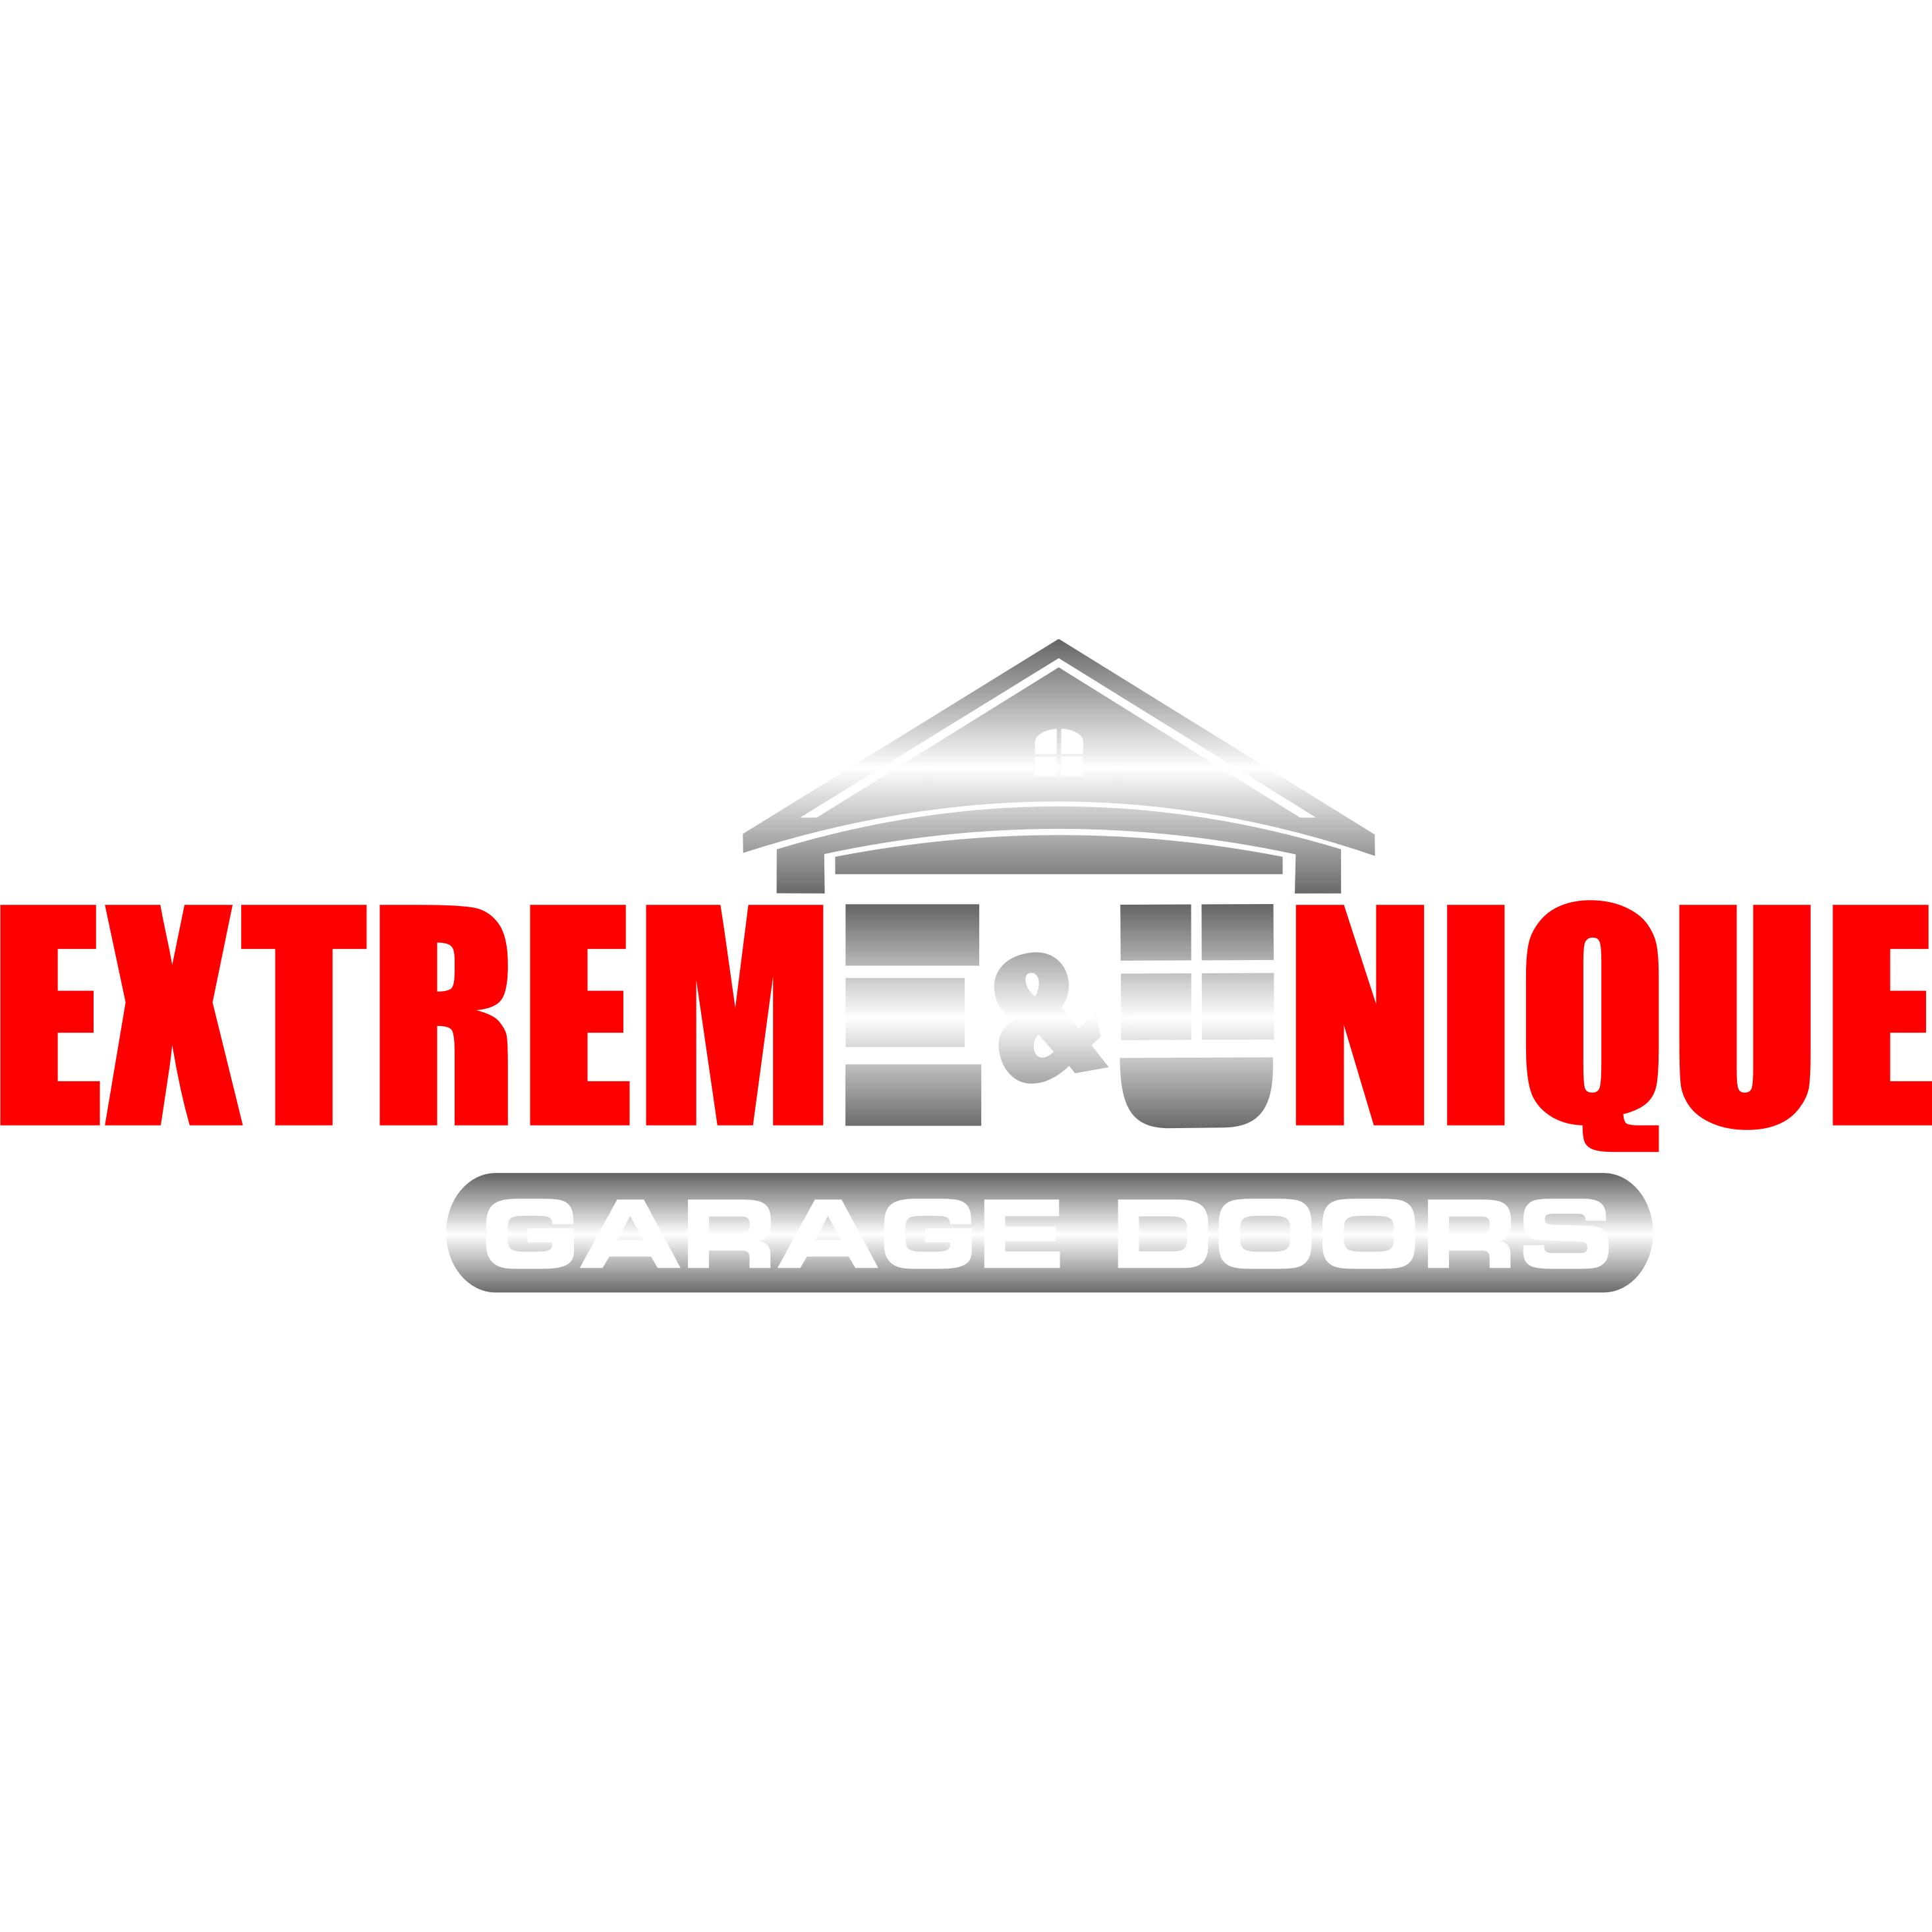 Extreme & Unique Garage Doors | Garage Door Repair Tucson Logo